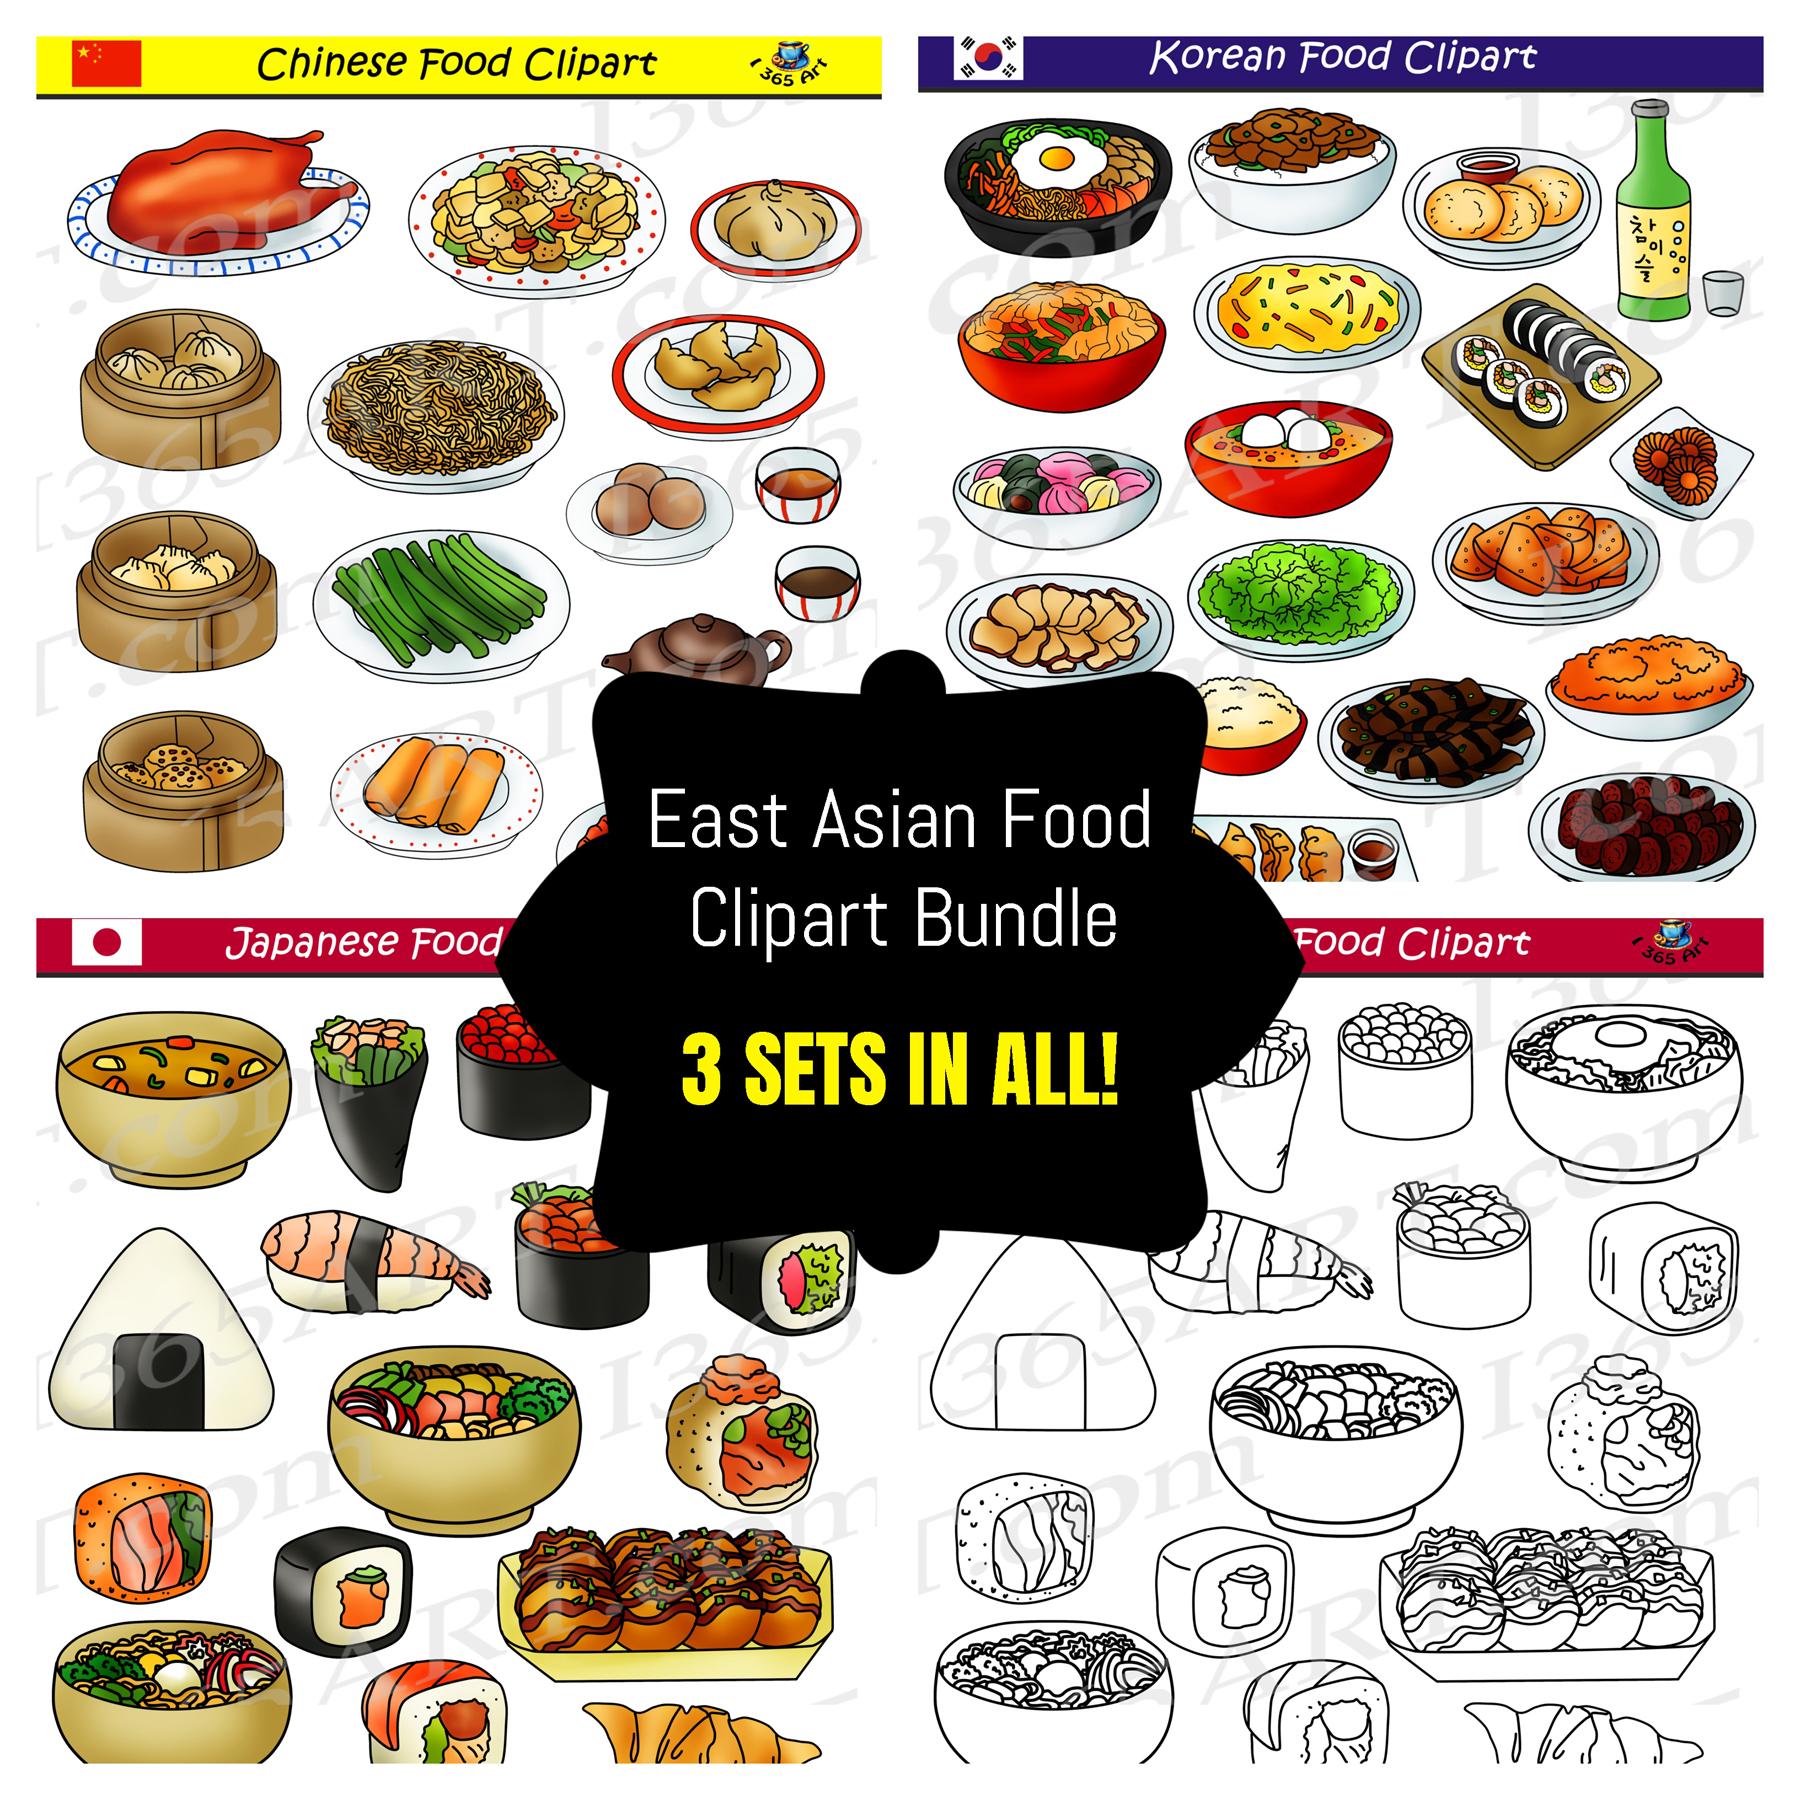 East Asian Food Clipart Bundle.